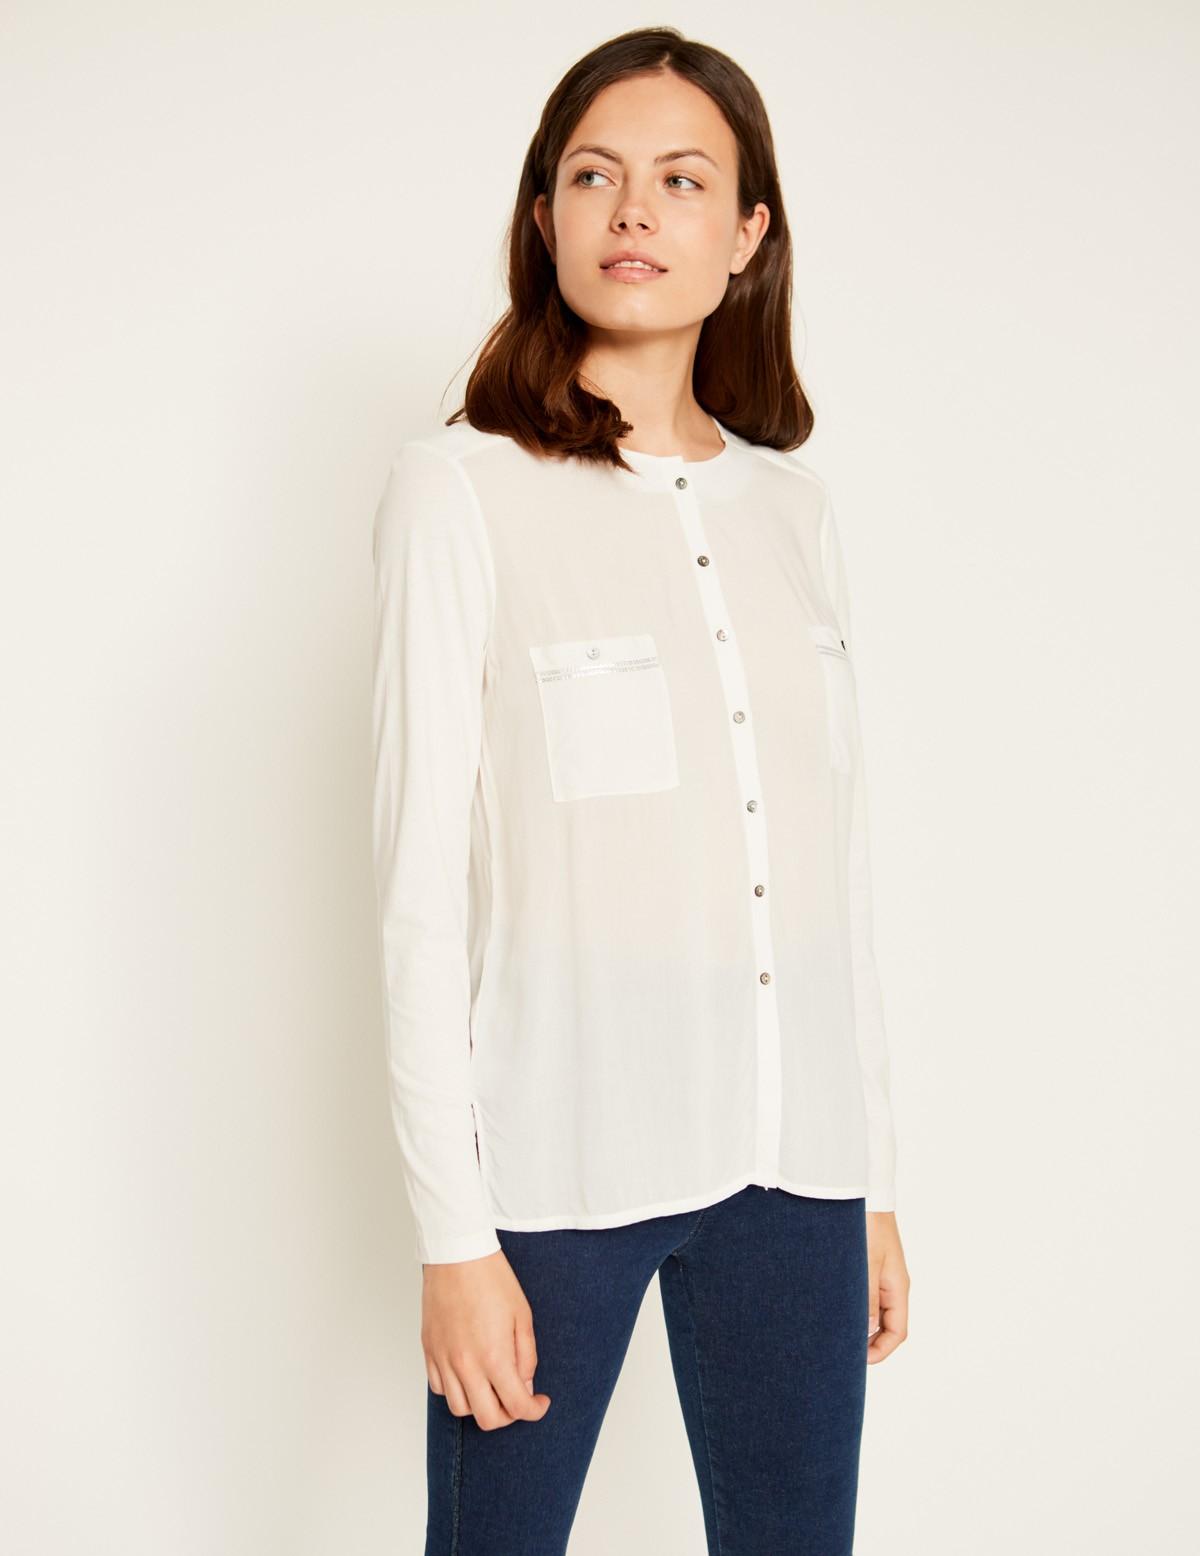 Camisa bimateria lentejuelas